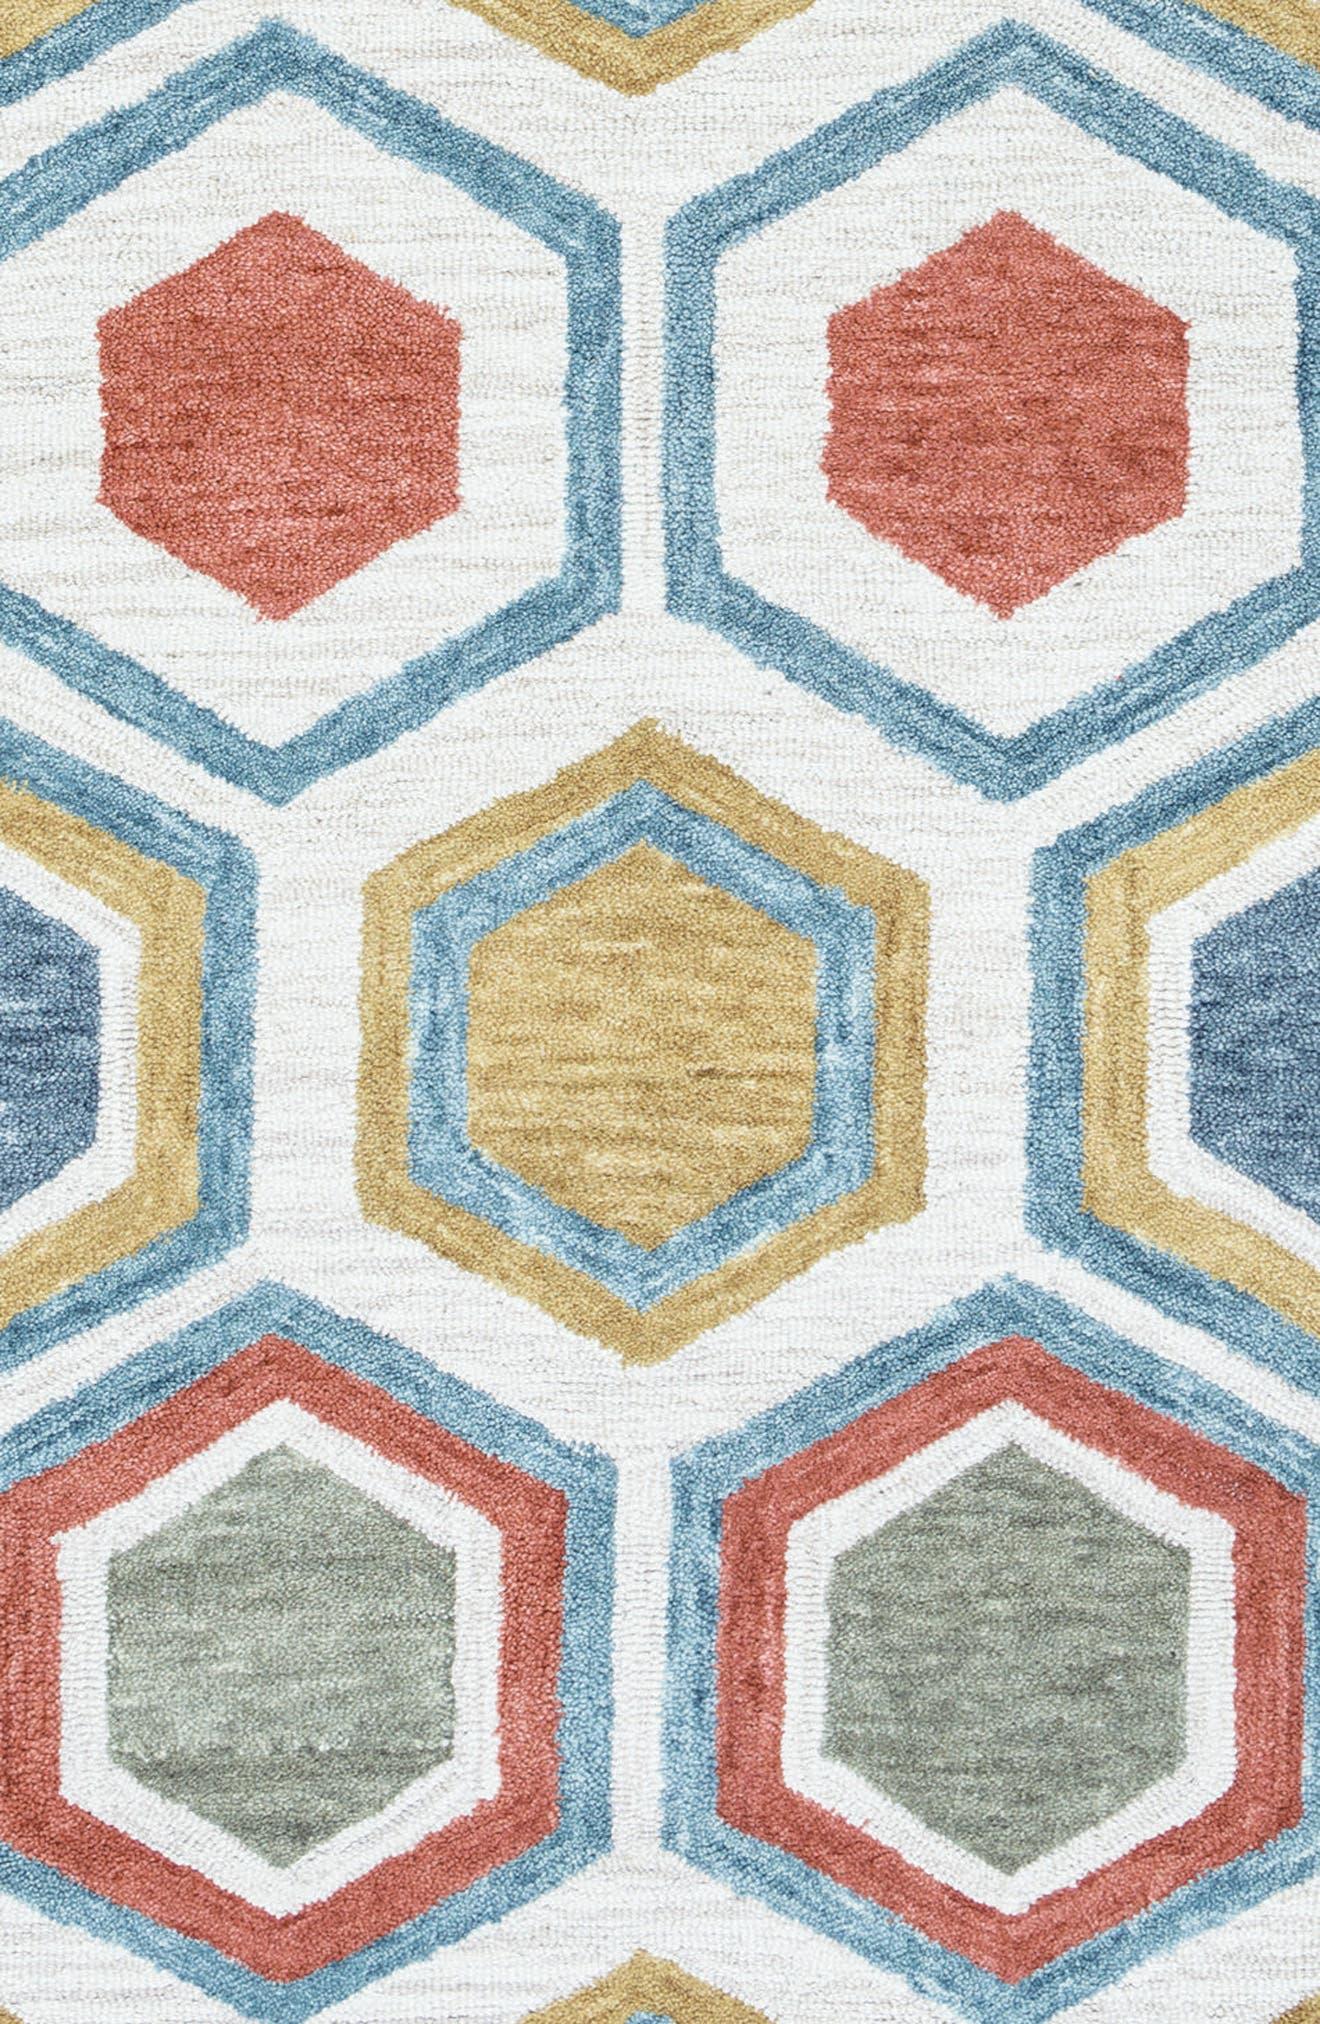 'Lancaster Geometric' Hand Tufted Wool Area Rug,                             Alternate thumbnail 5, color,                             020